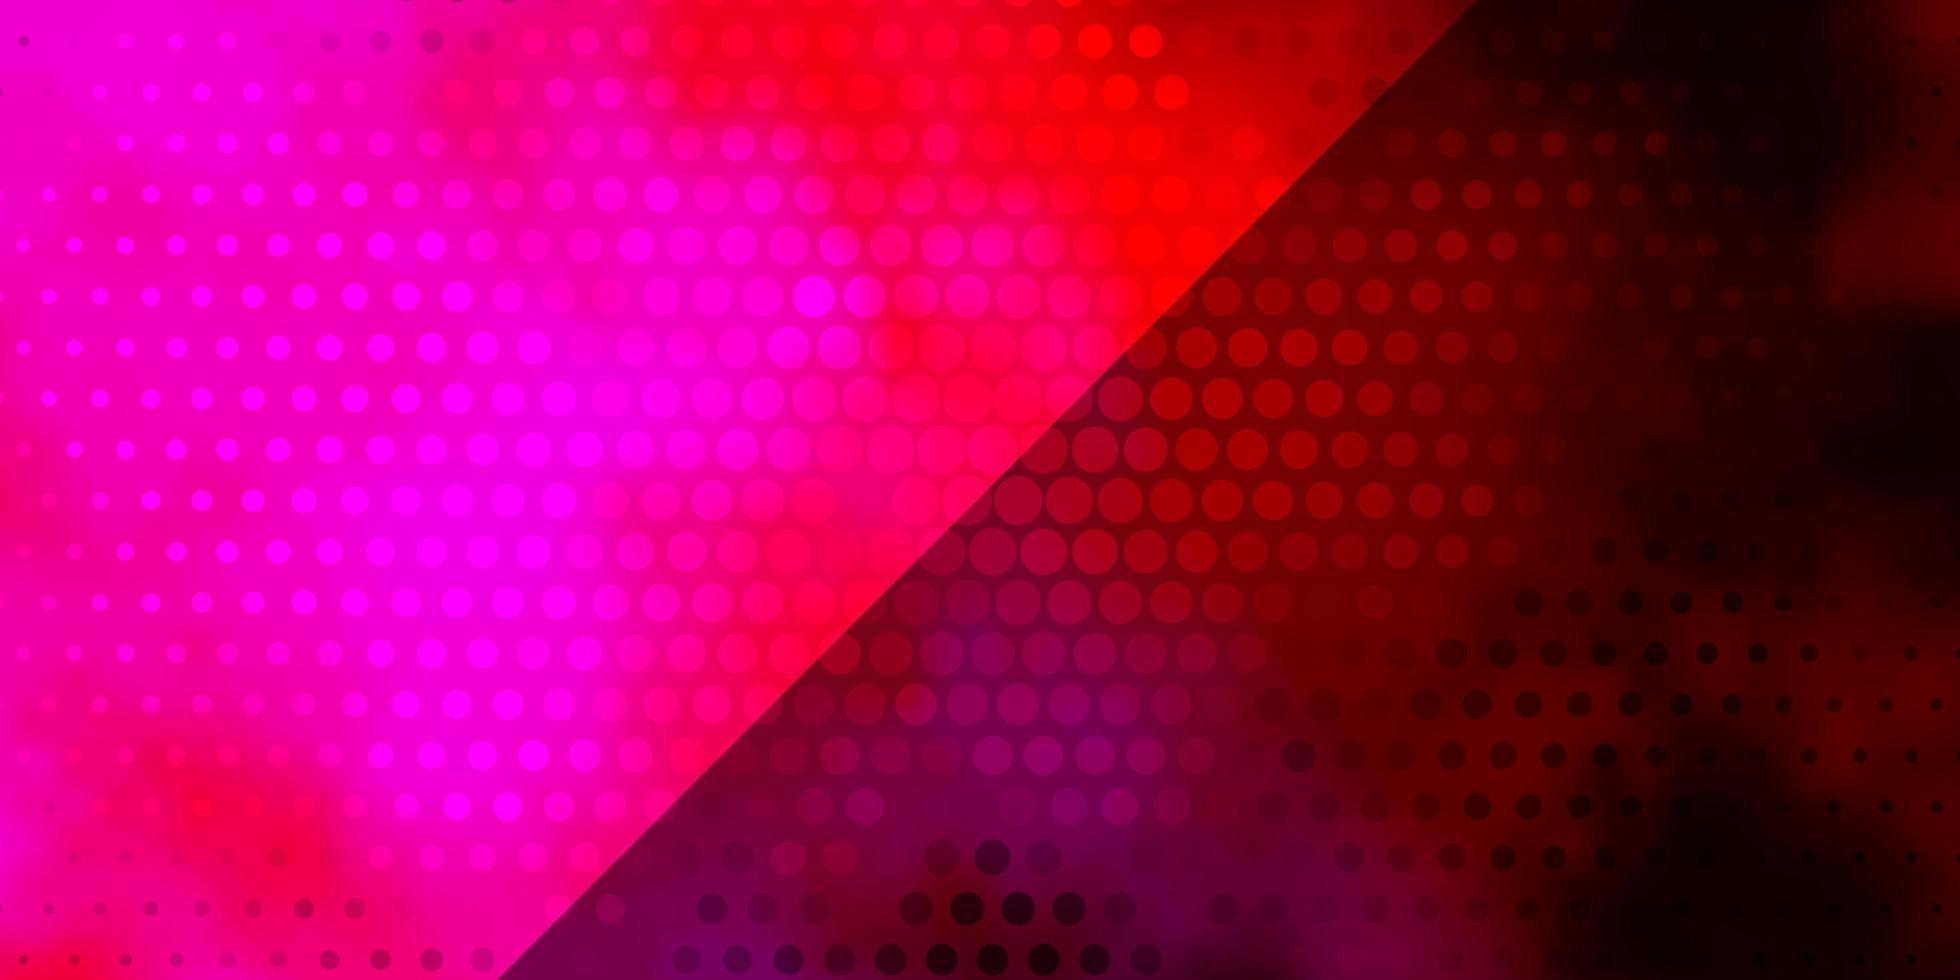 Fondo de vector púrpura oscuro, rosa con círculos